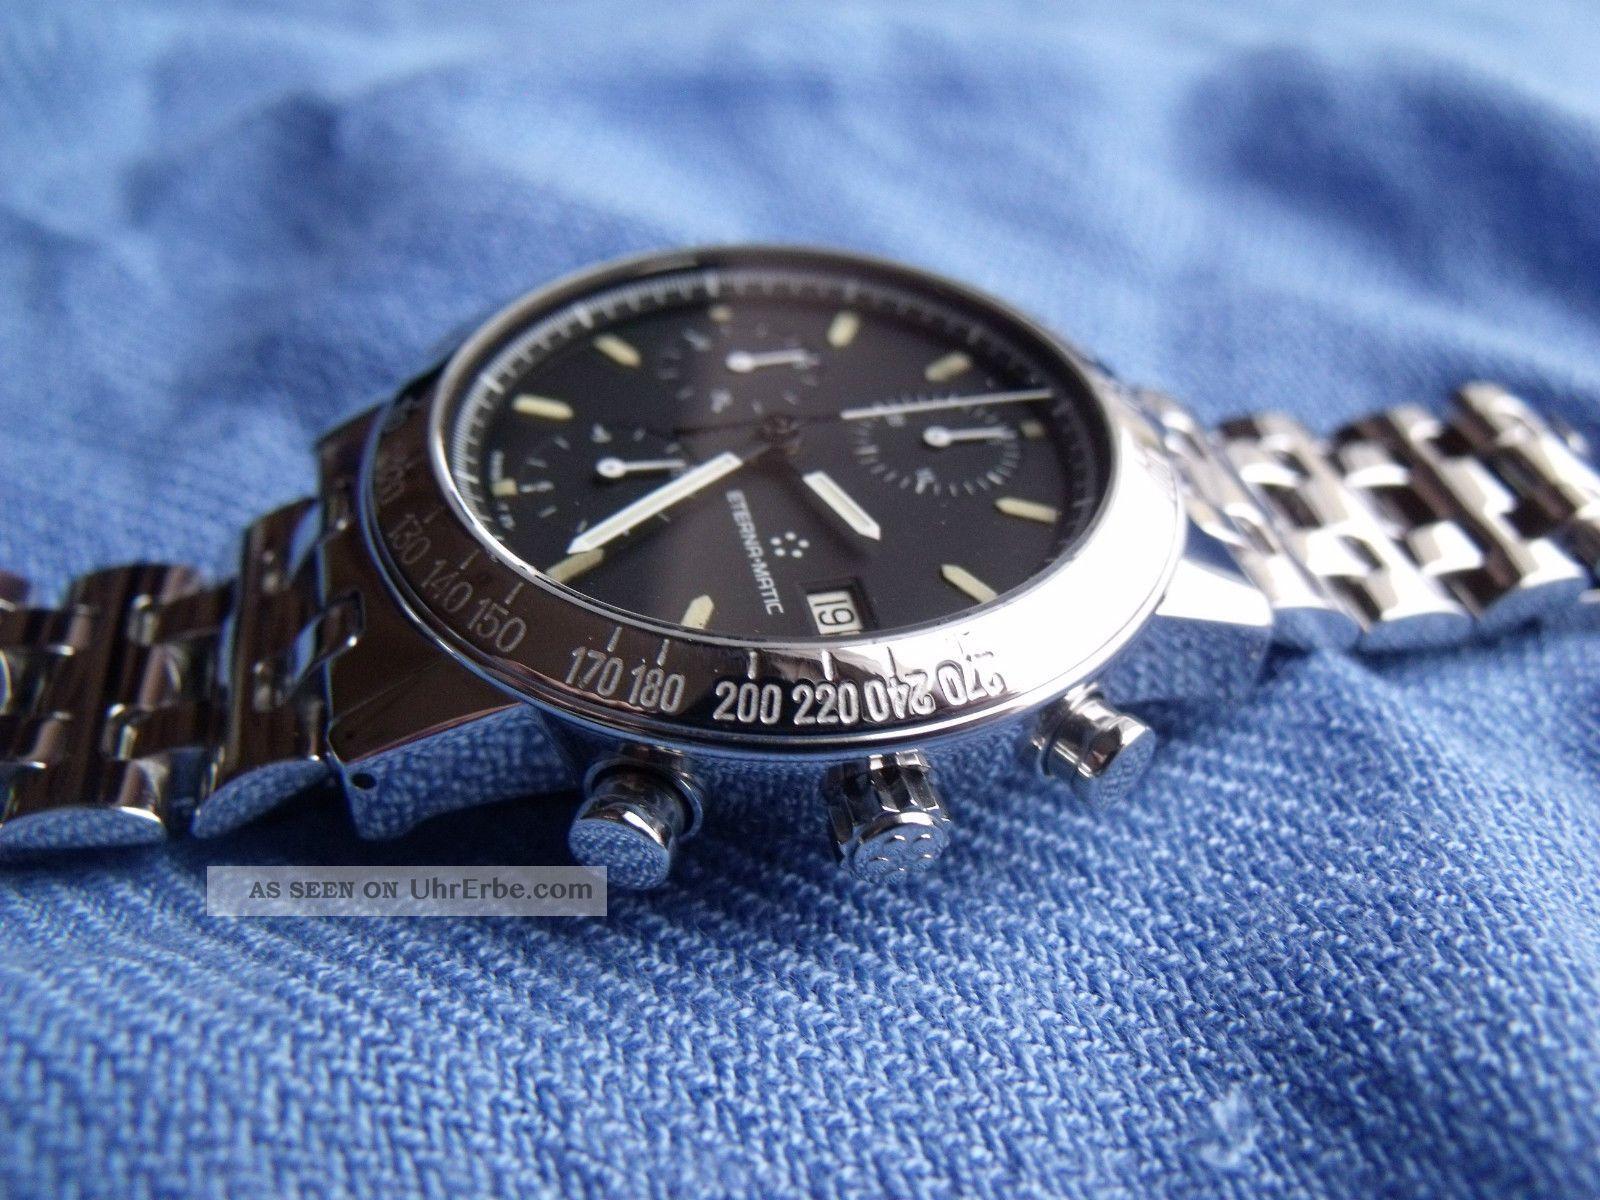 Eterna Kontiki 1856 Automatic Chronograph Valjoux 7750 Armbanduhren Bild